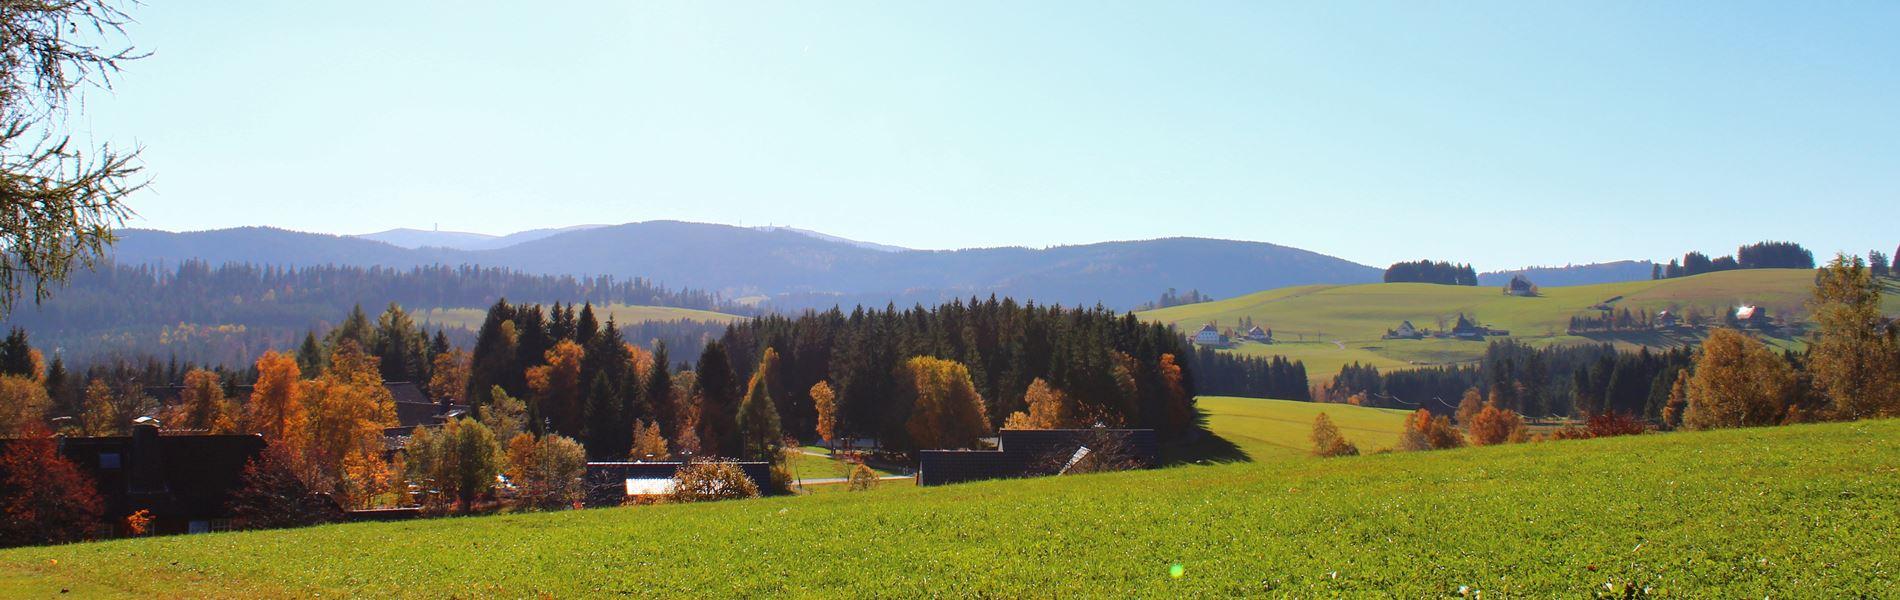 Breitnau im Schwarzwald Blick auf den Feldberg